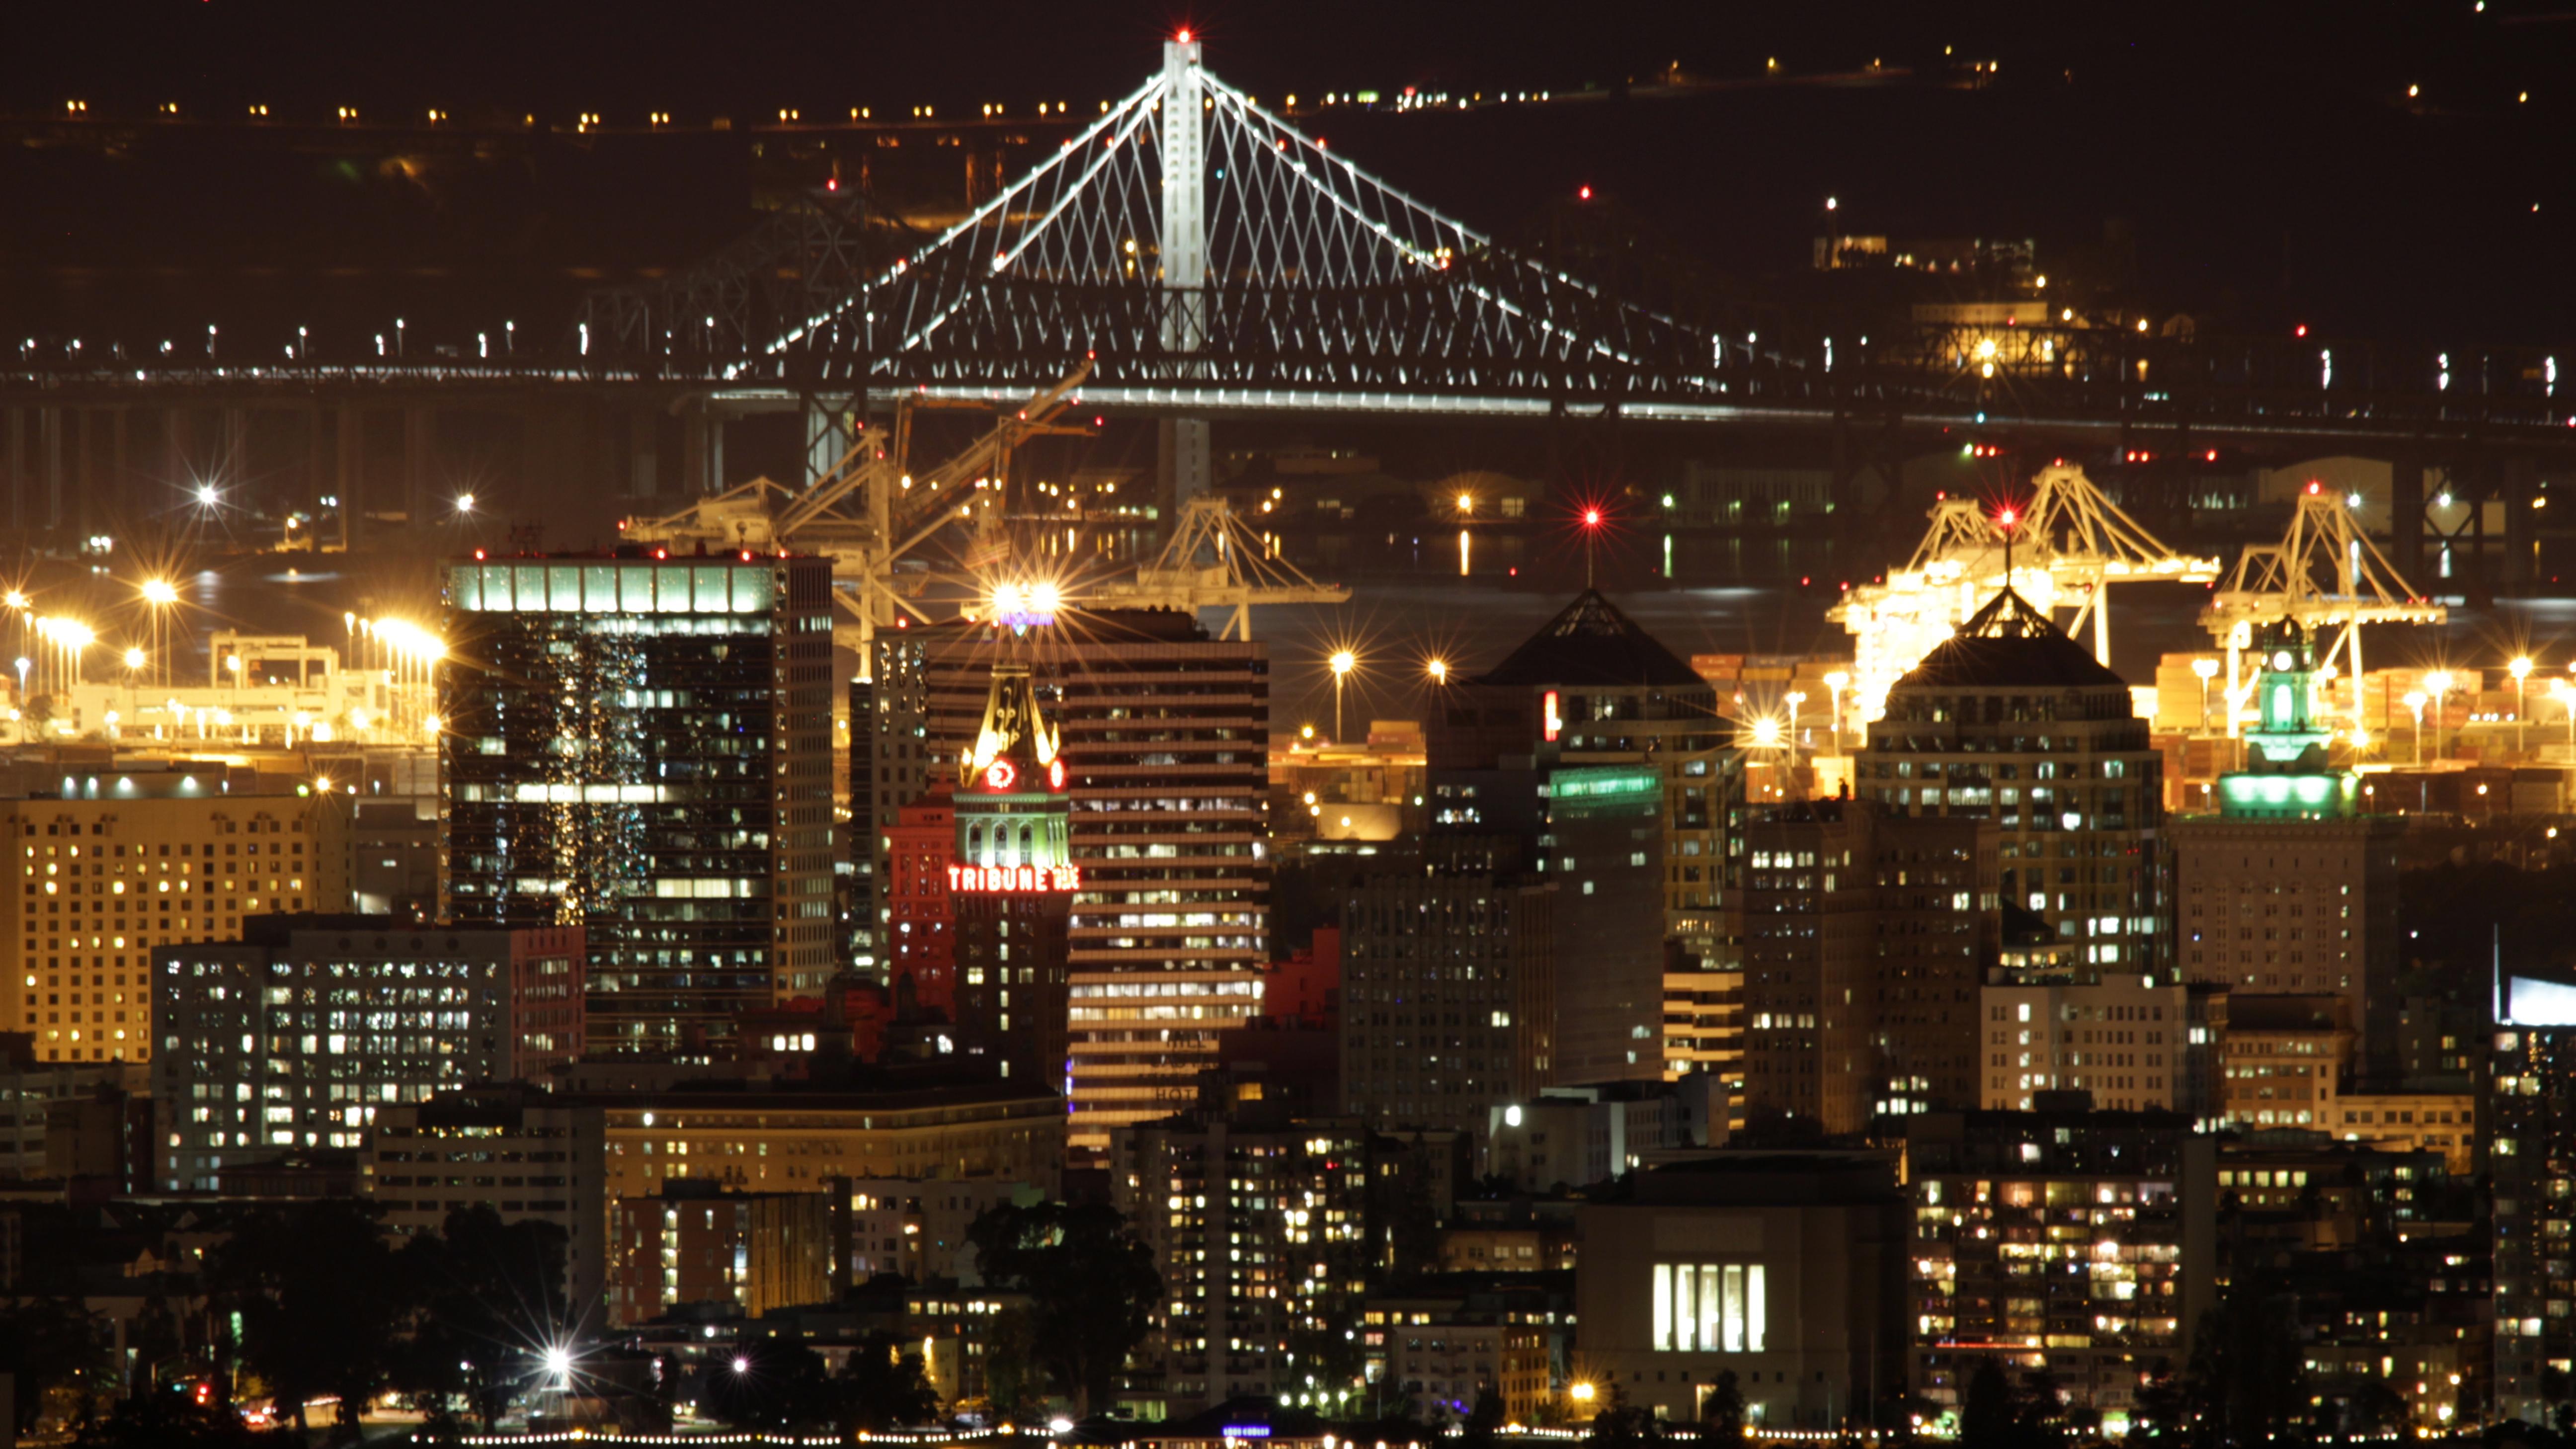 OAKLAND_CA_USA_-_Night_Skyline_with_Bay_Bridge